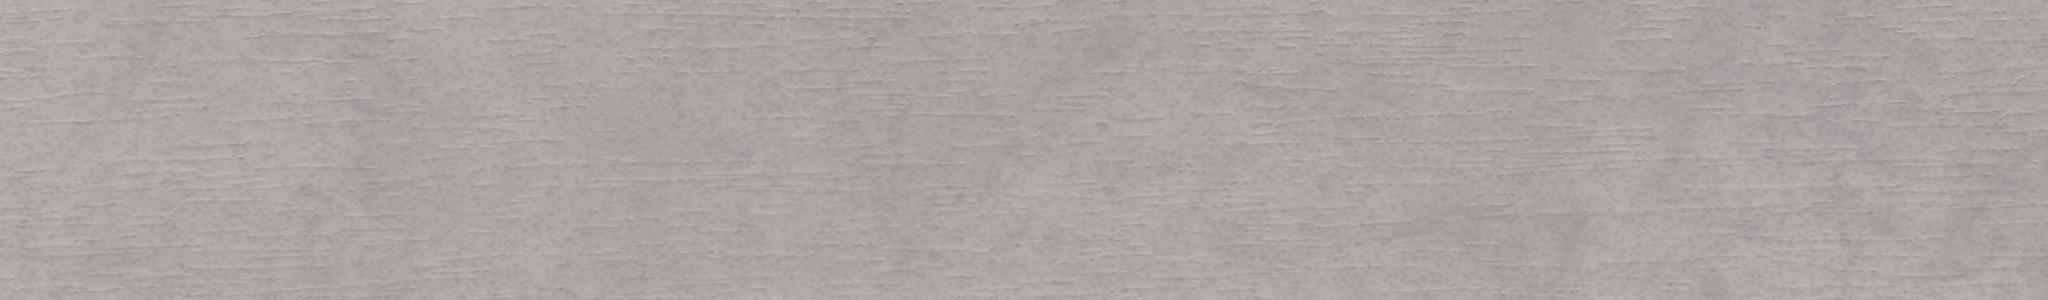 HD 292326 ABS hrana Gypsum Grifio gravír